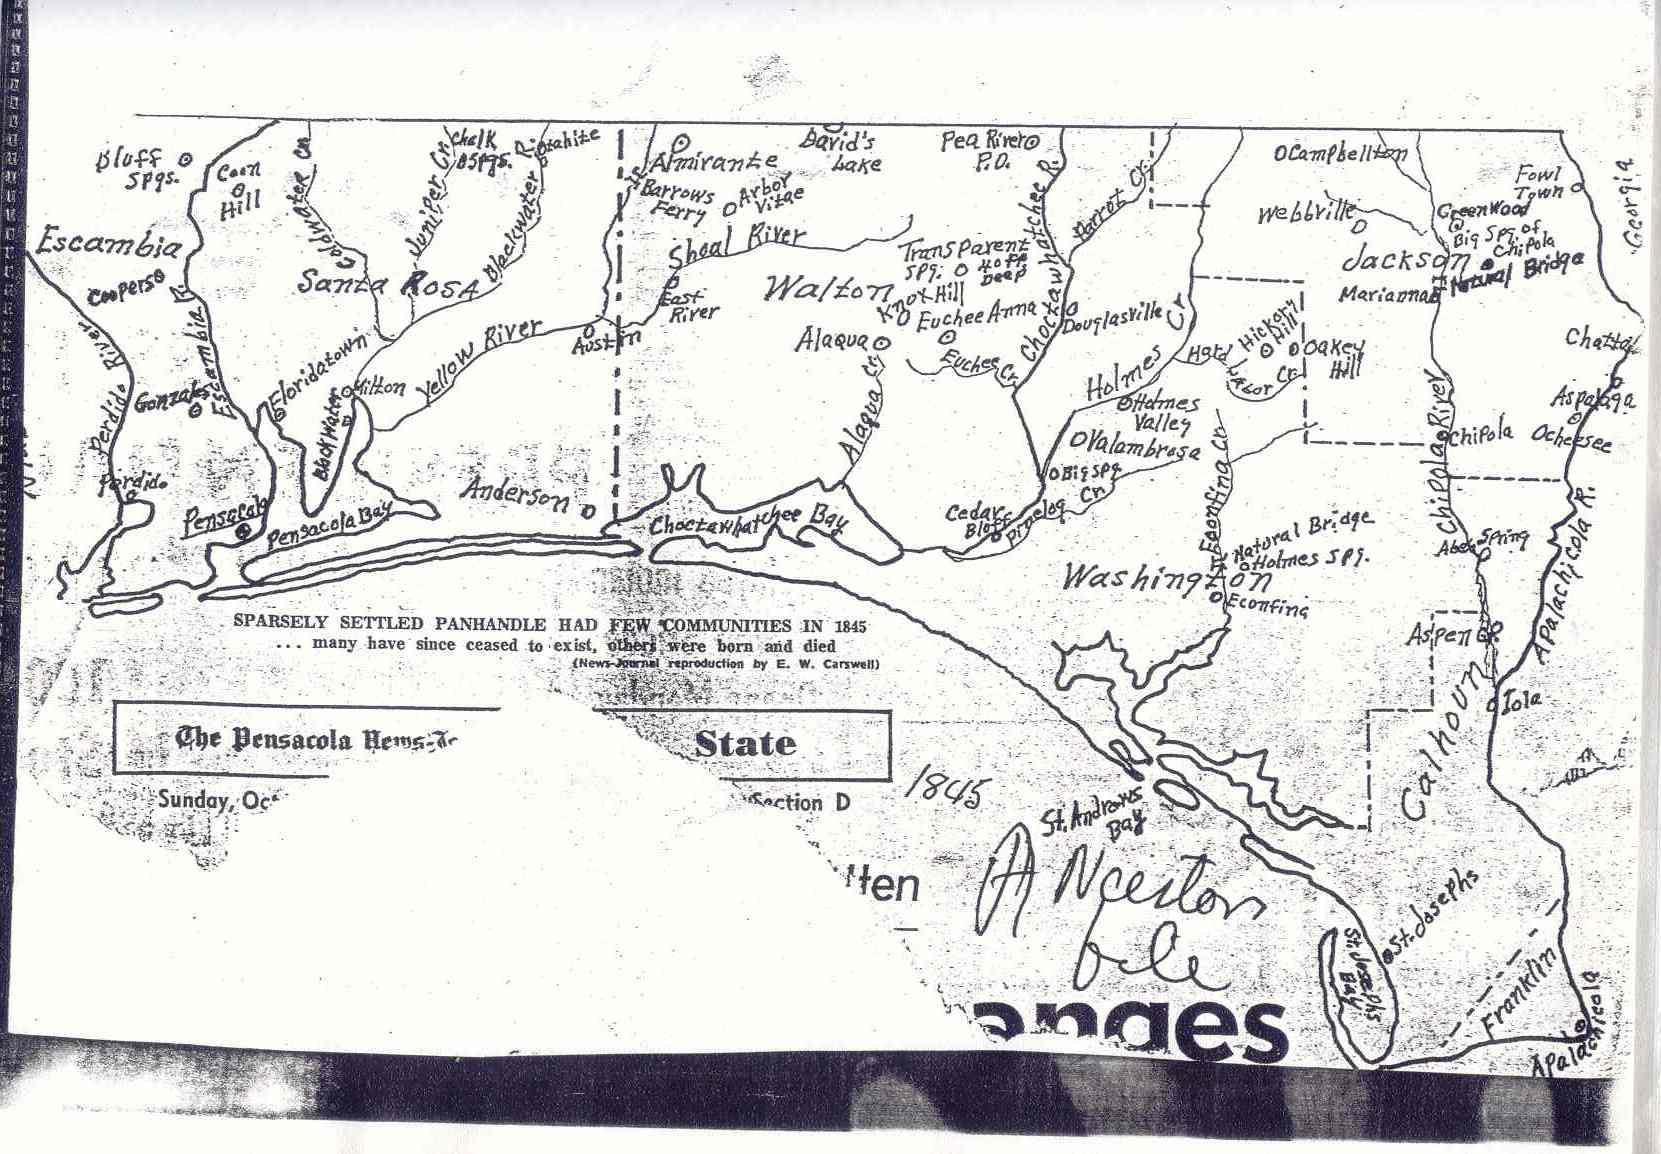 Baker Block Museum Map Collection - Niceville Florida Map